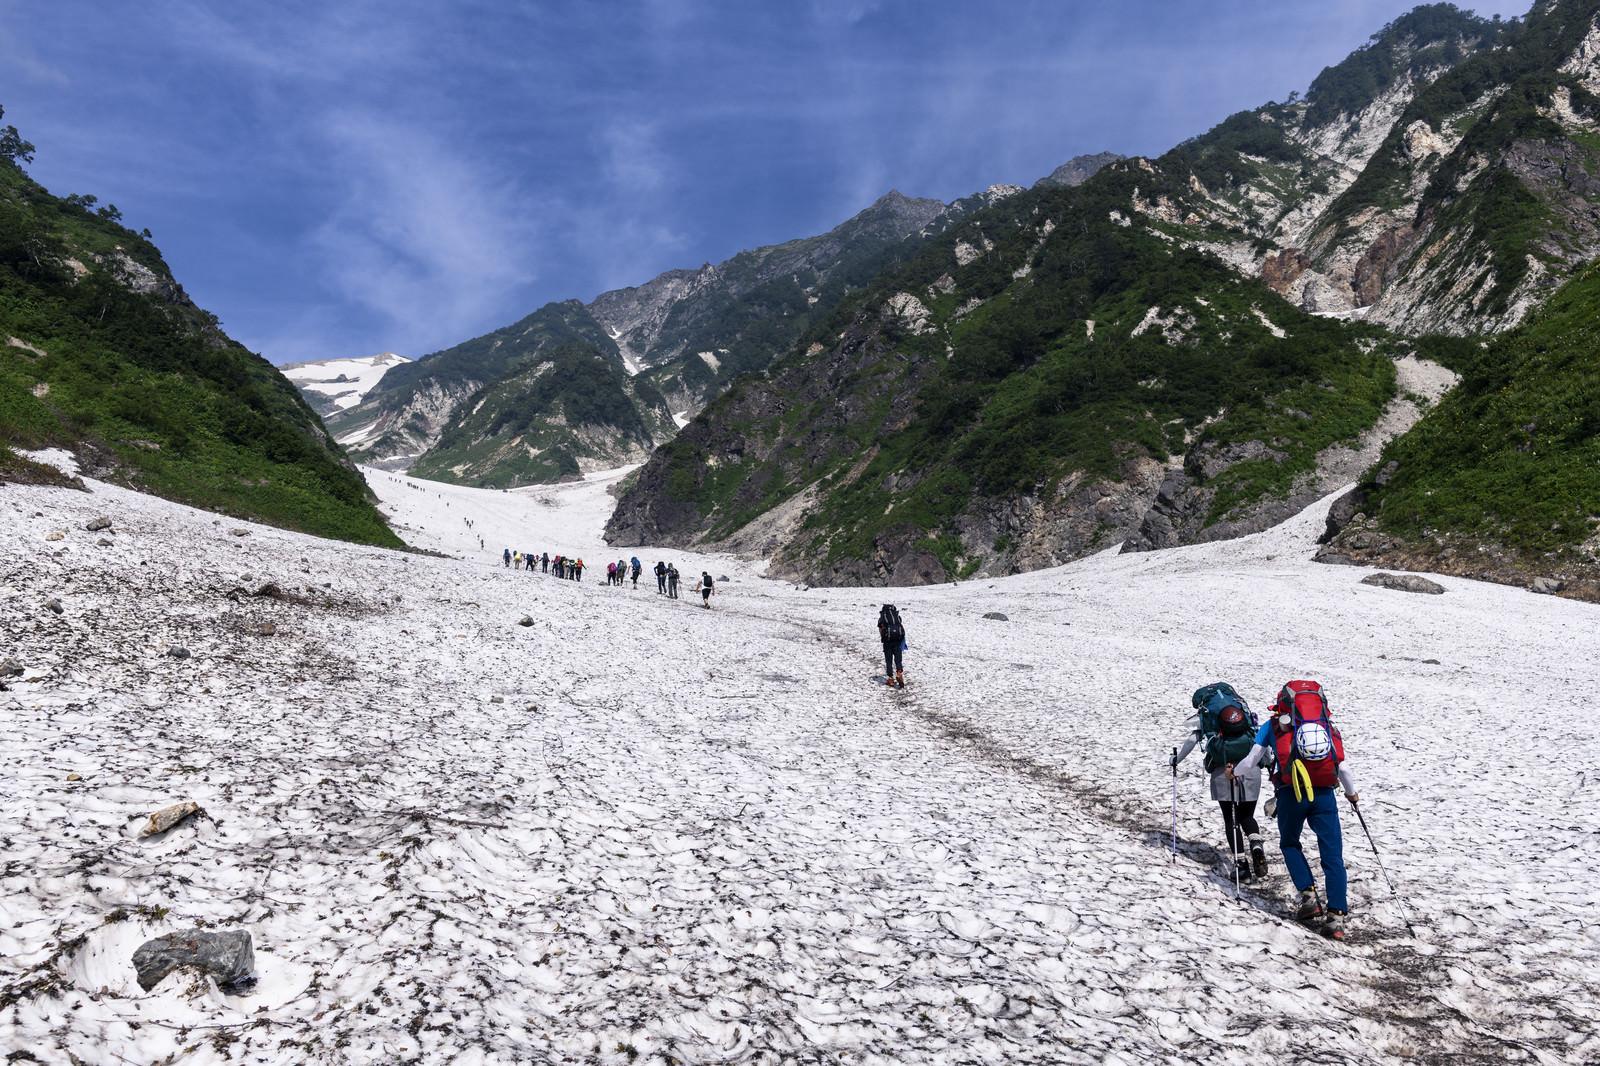 「白馬大雪渓を登る登山者(白馬岳)」の写真